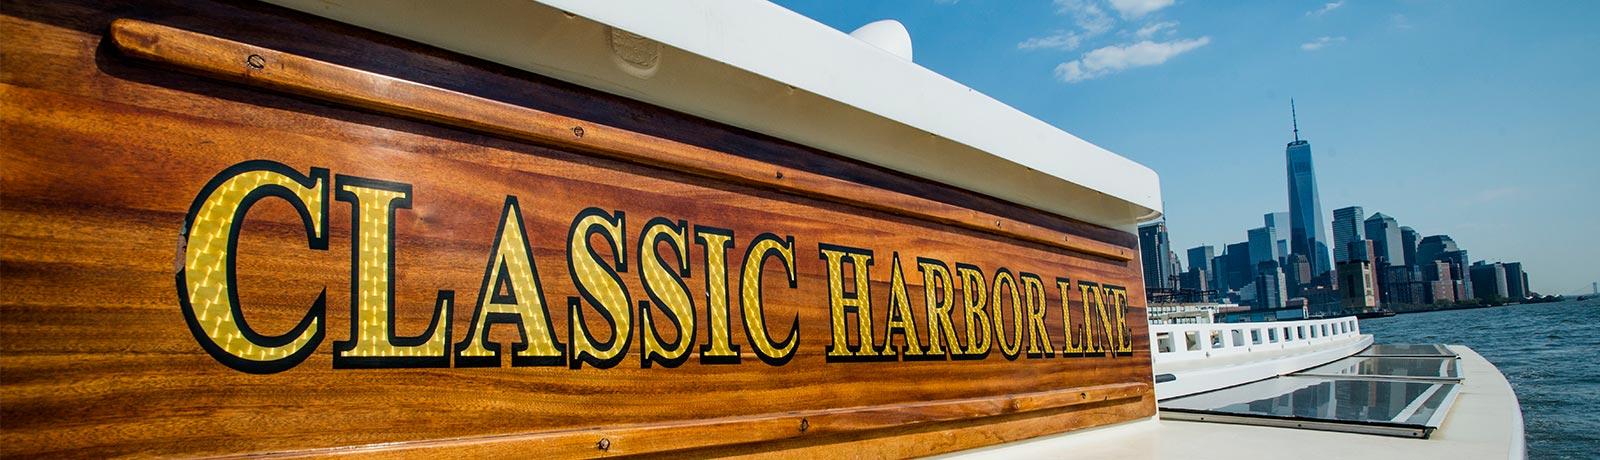 97e6a6df9d1 Classic Harbor Line